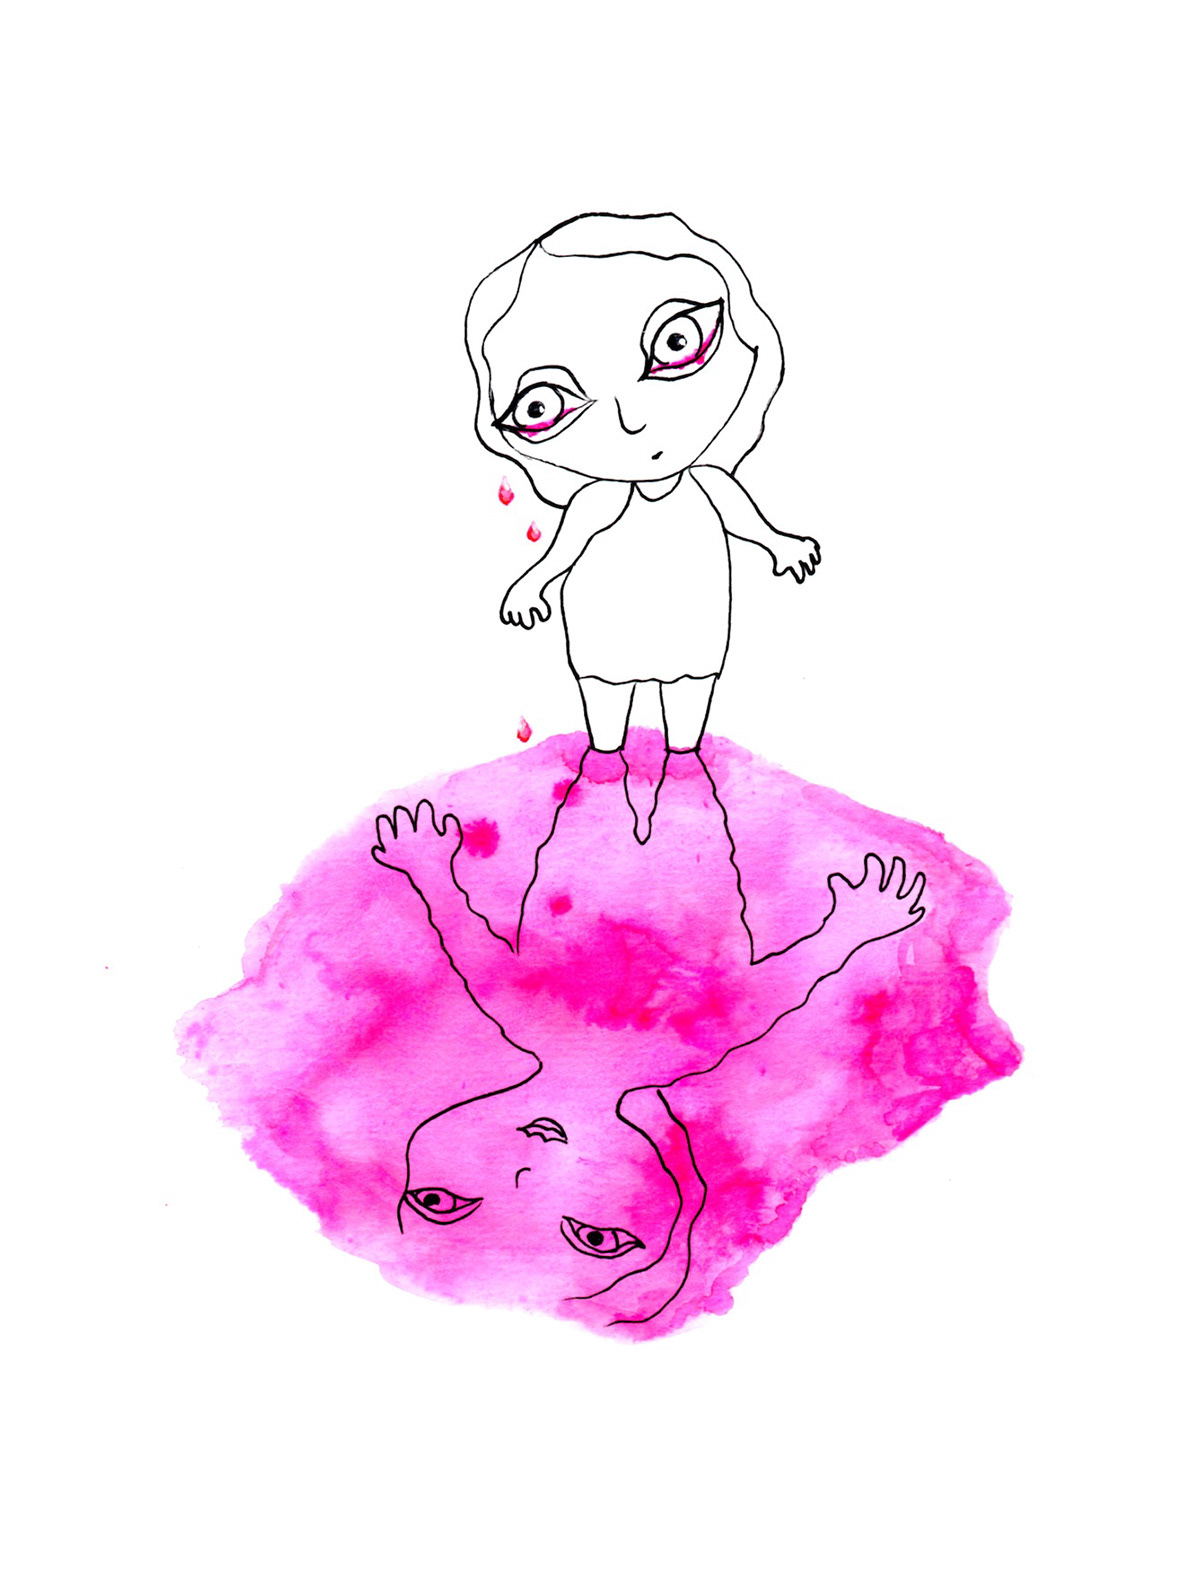 paper hand-painted character development ILLUSTRATION  Drawing  watercolor ink alex mitchell twinki-winki process